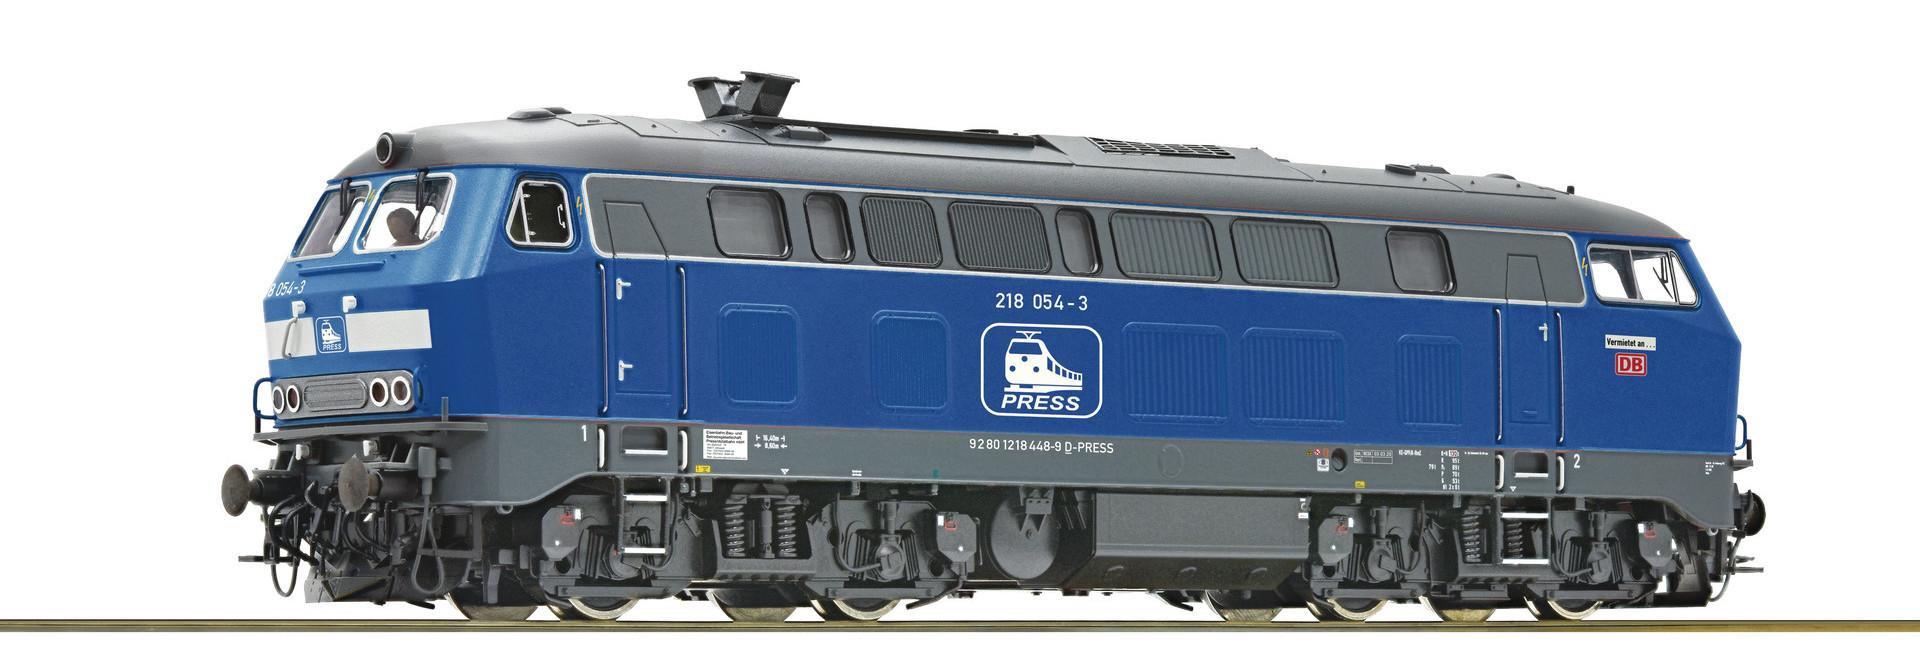 70755 Diesellok BR 218 Press Snd.